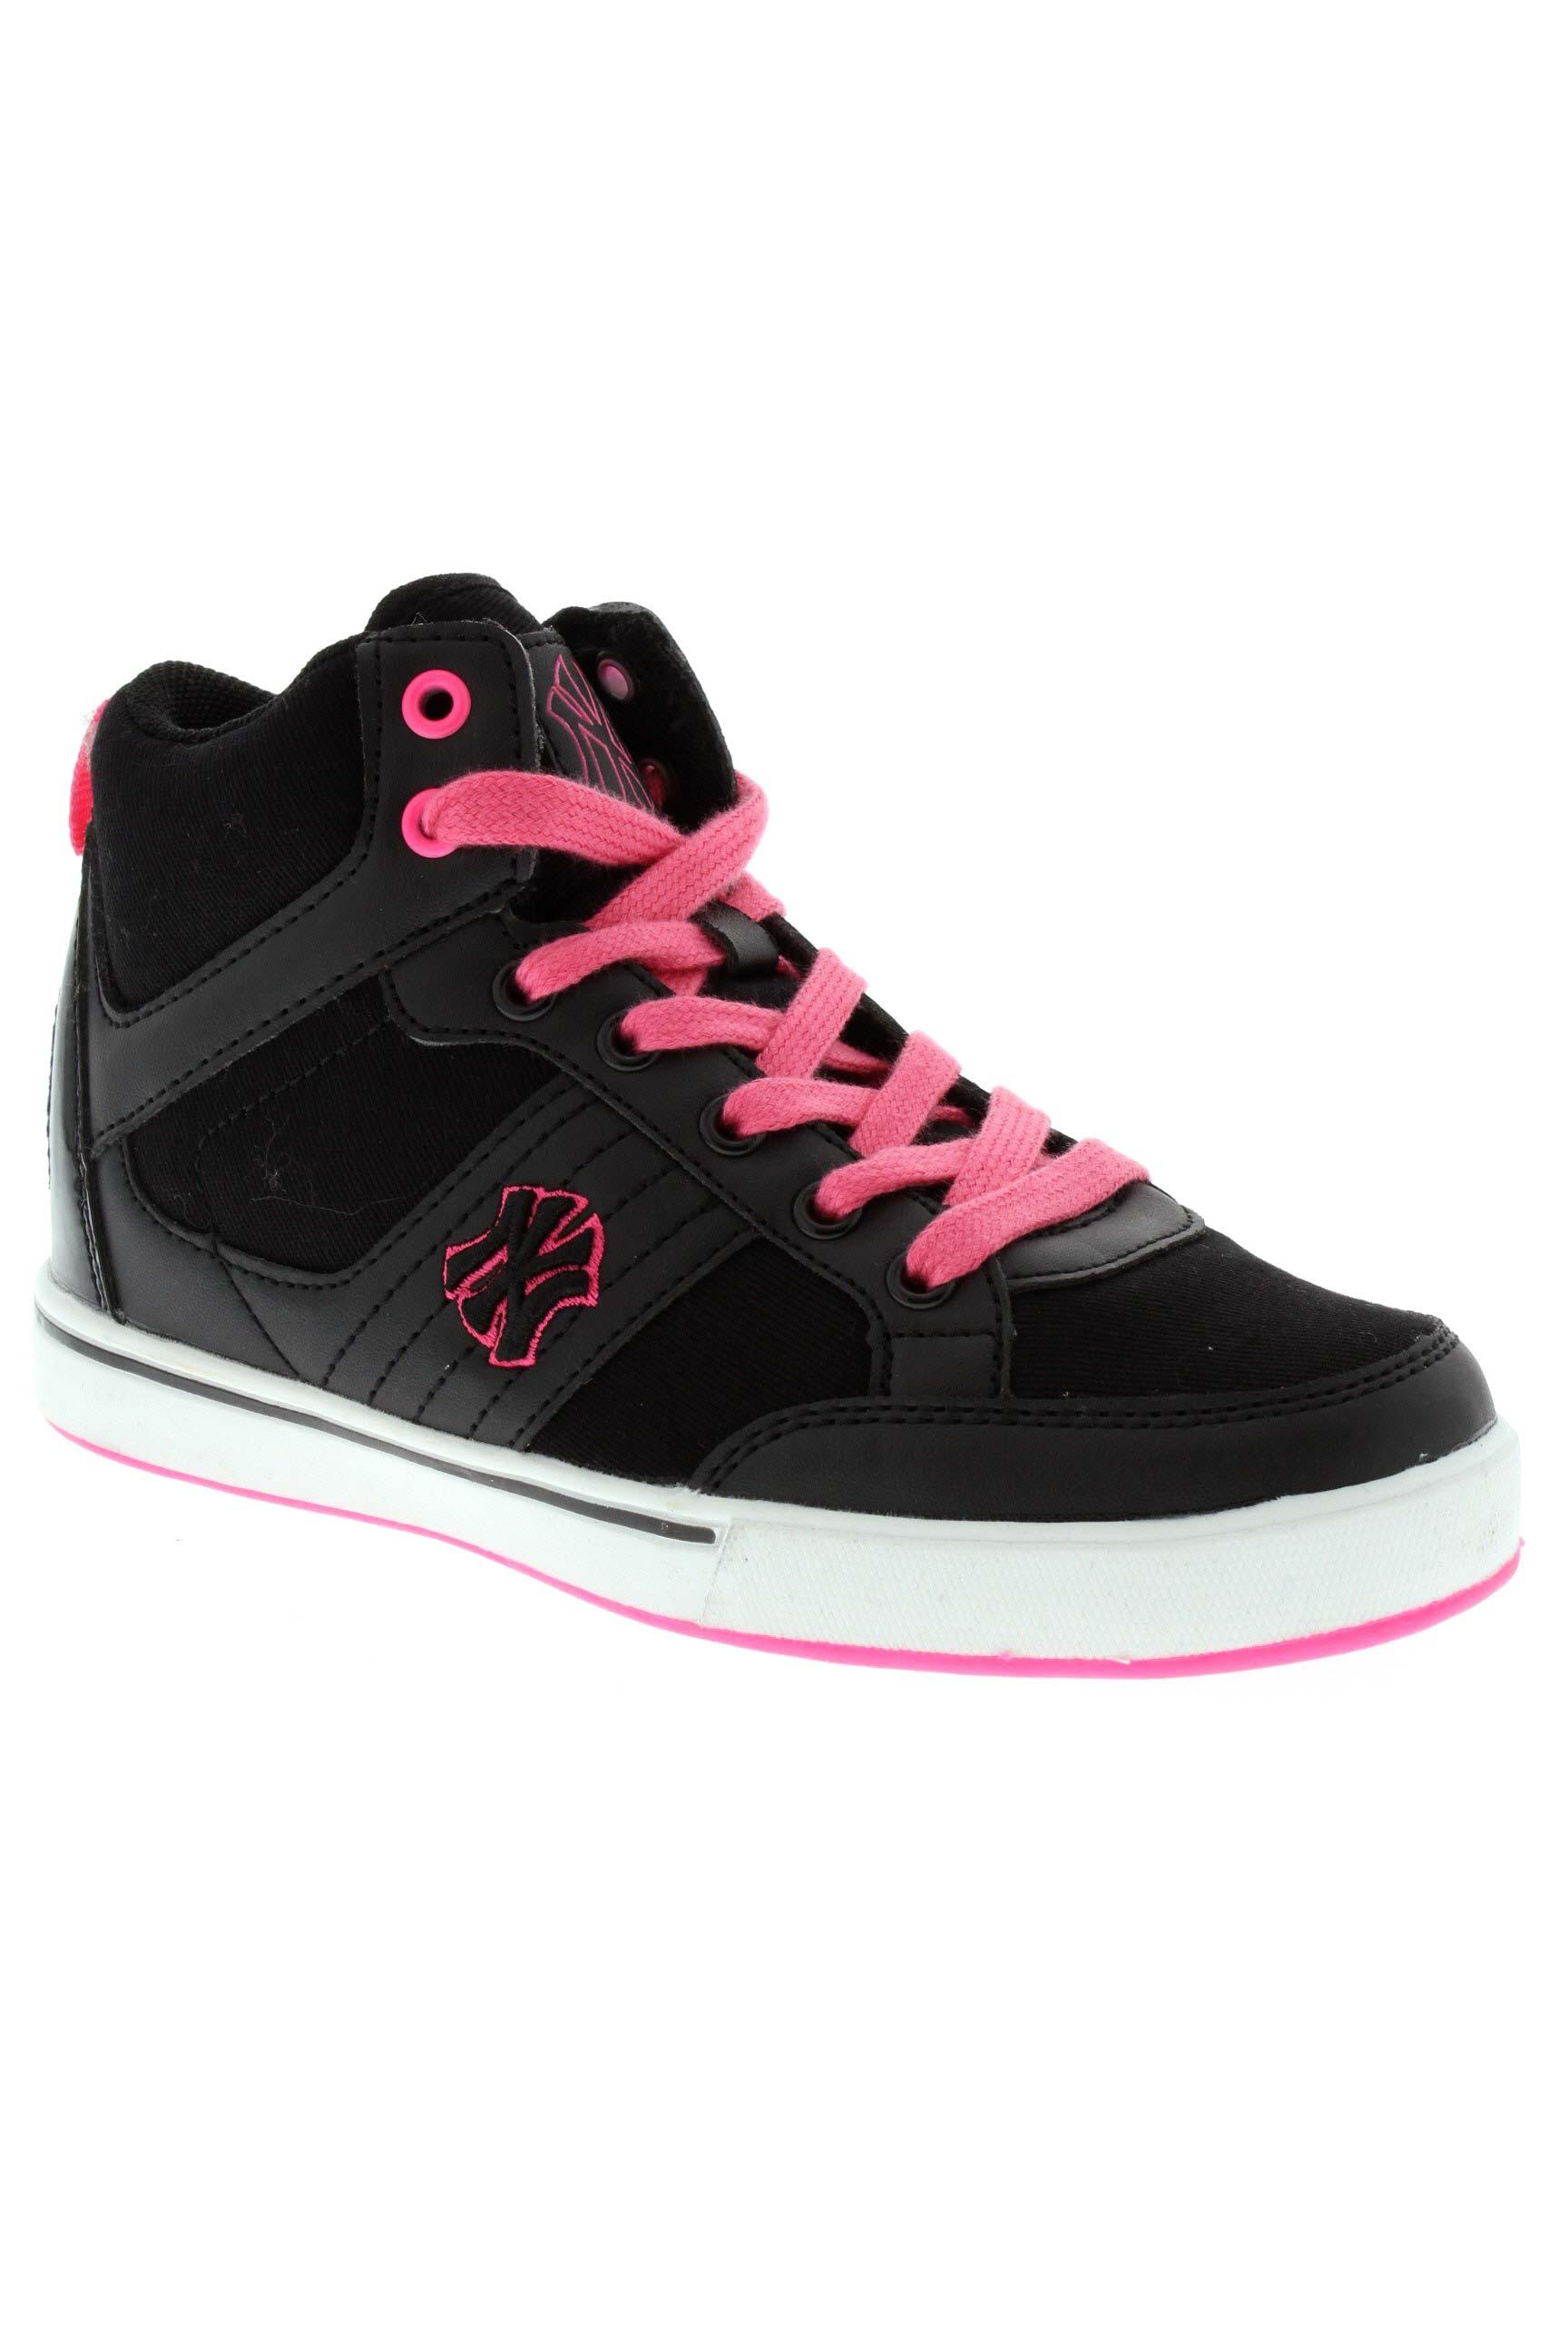 Chaussures baskets Reebok pour homme   SneakerStudio #2